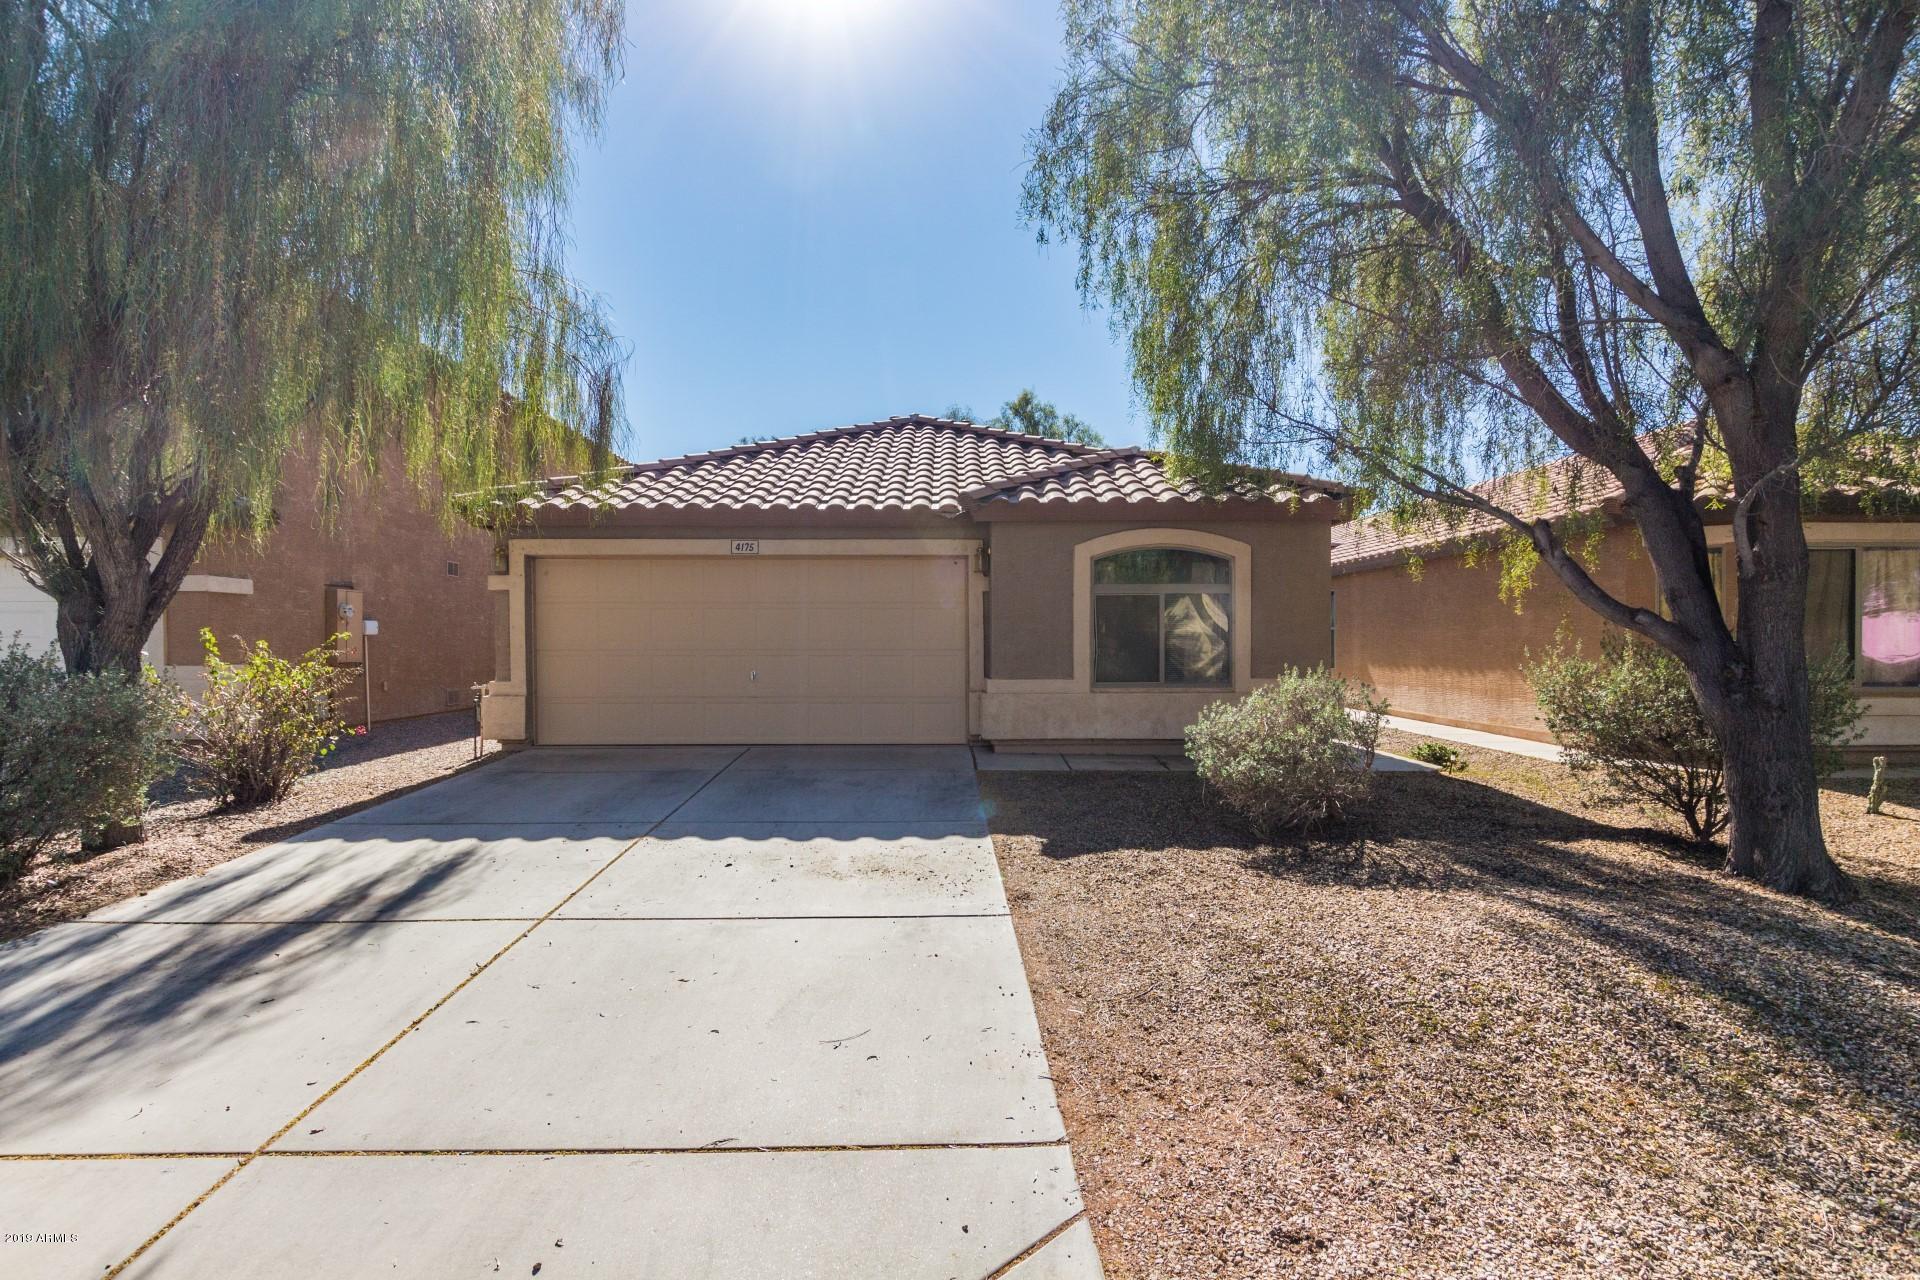 Photo of 4175 E CITRINE Road, San Tan Valley, AZ 85143